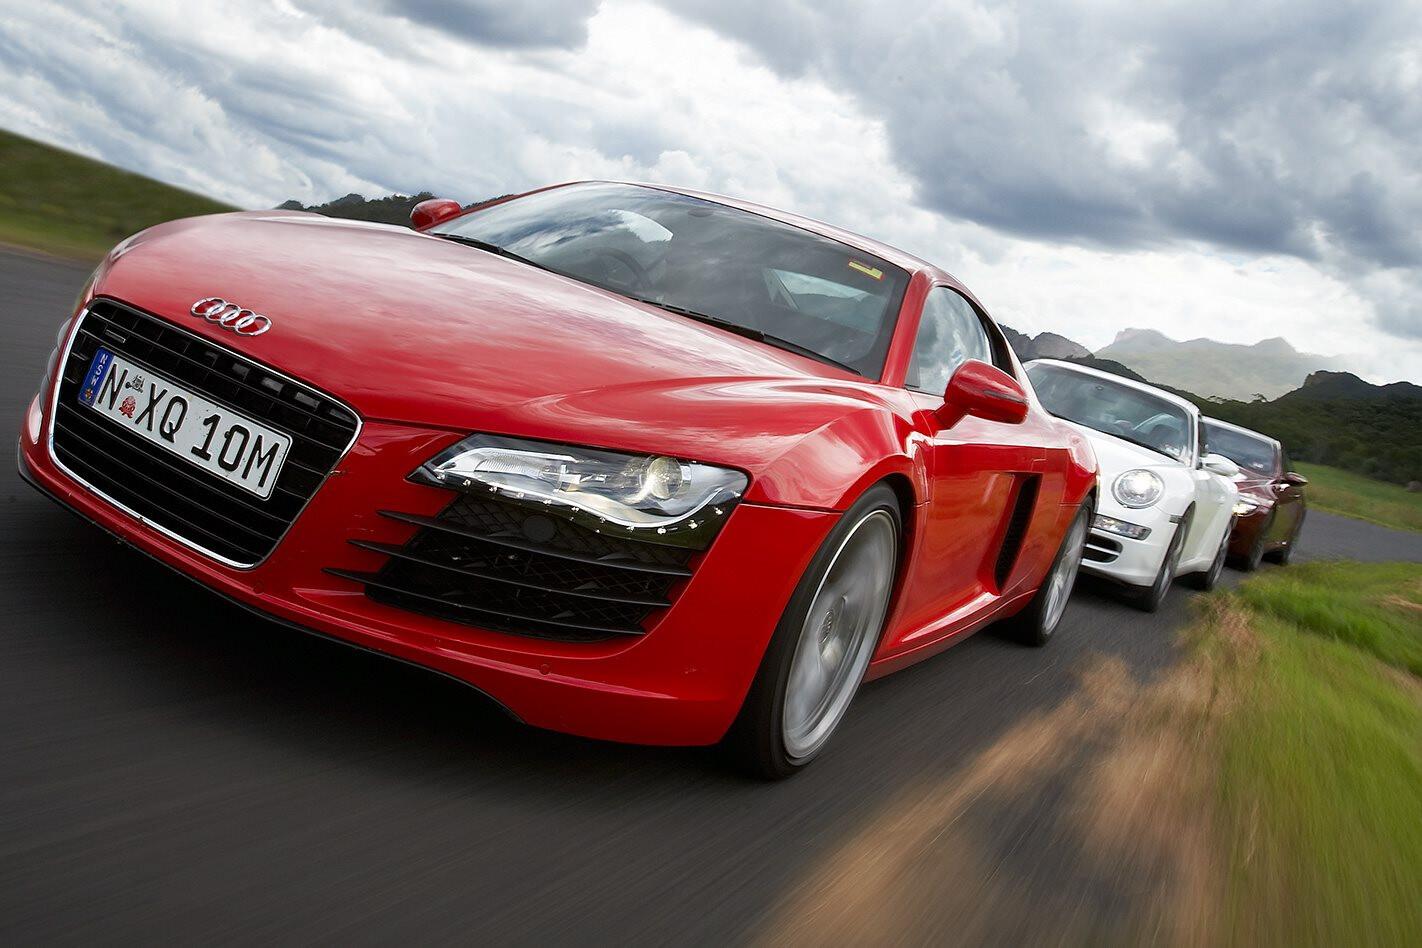 Audi R8 vs Porsche 911 Carrera S vs BMW M6 front